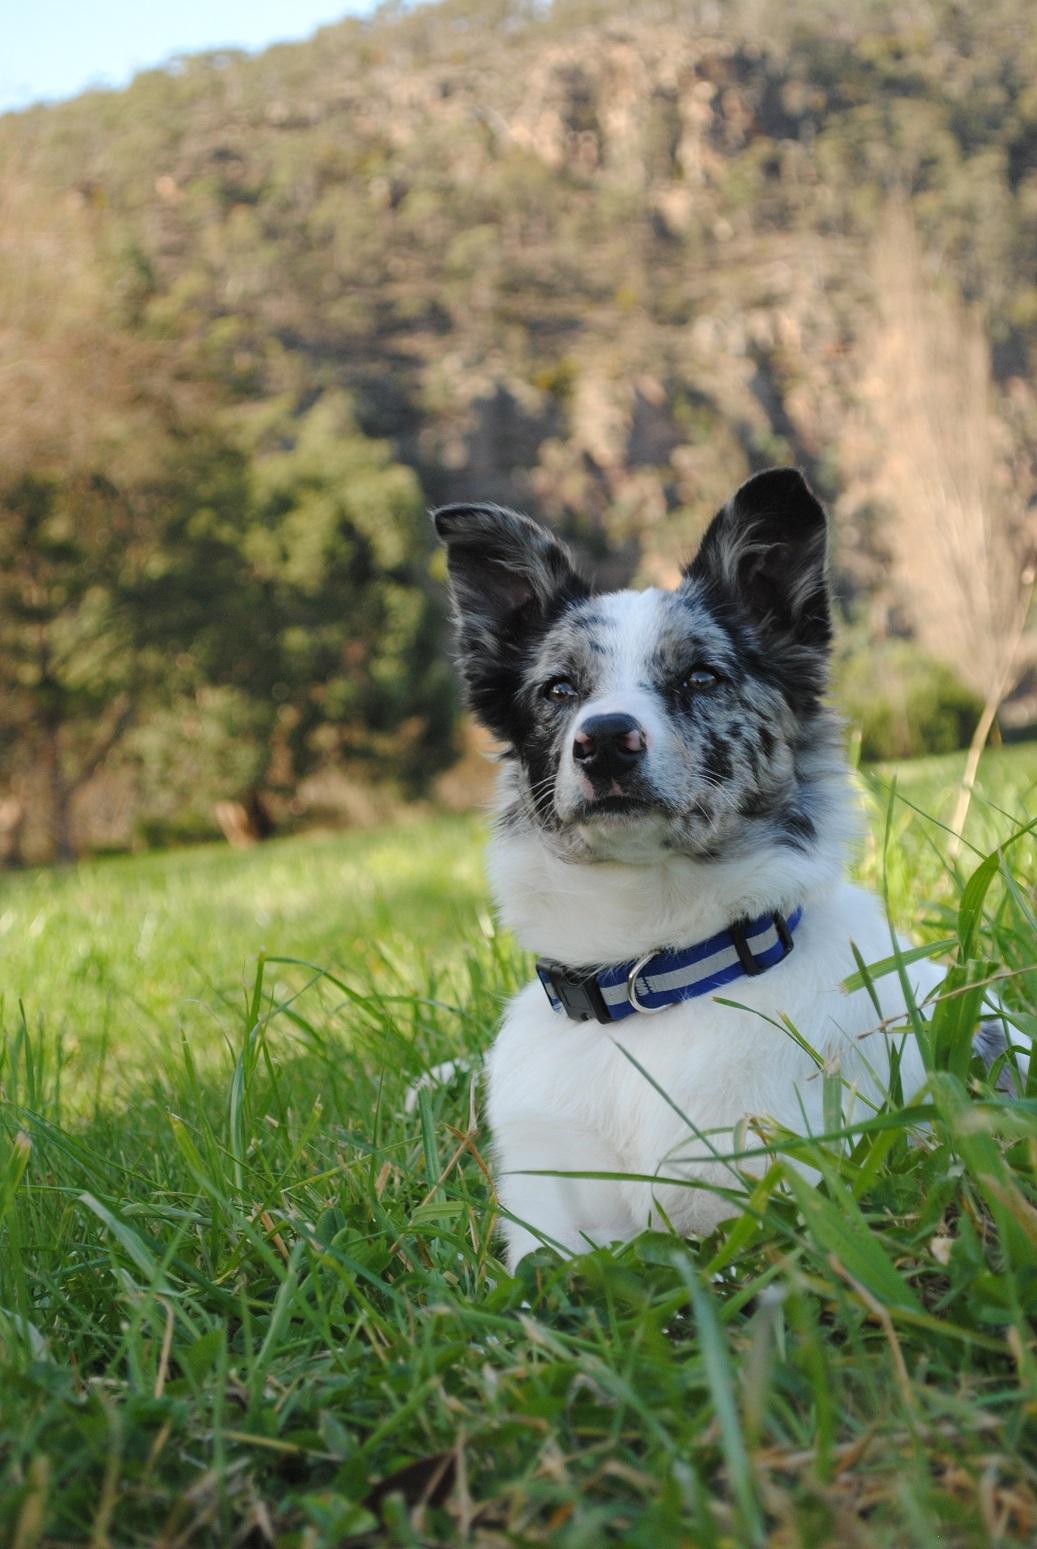 Cute Korean Wallpapers Desktop Koolie Dog On The Grass Photo And Wallpaper Beautiful